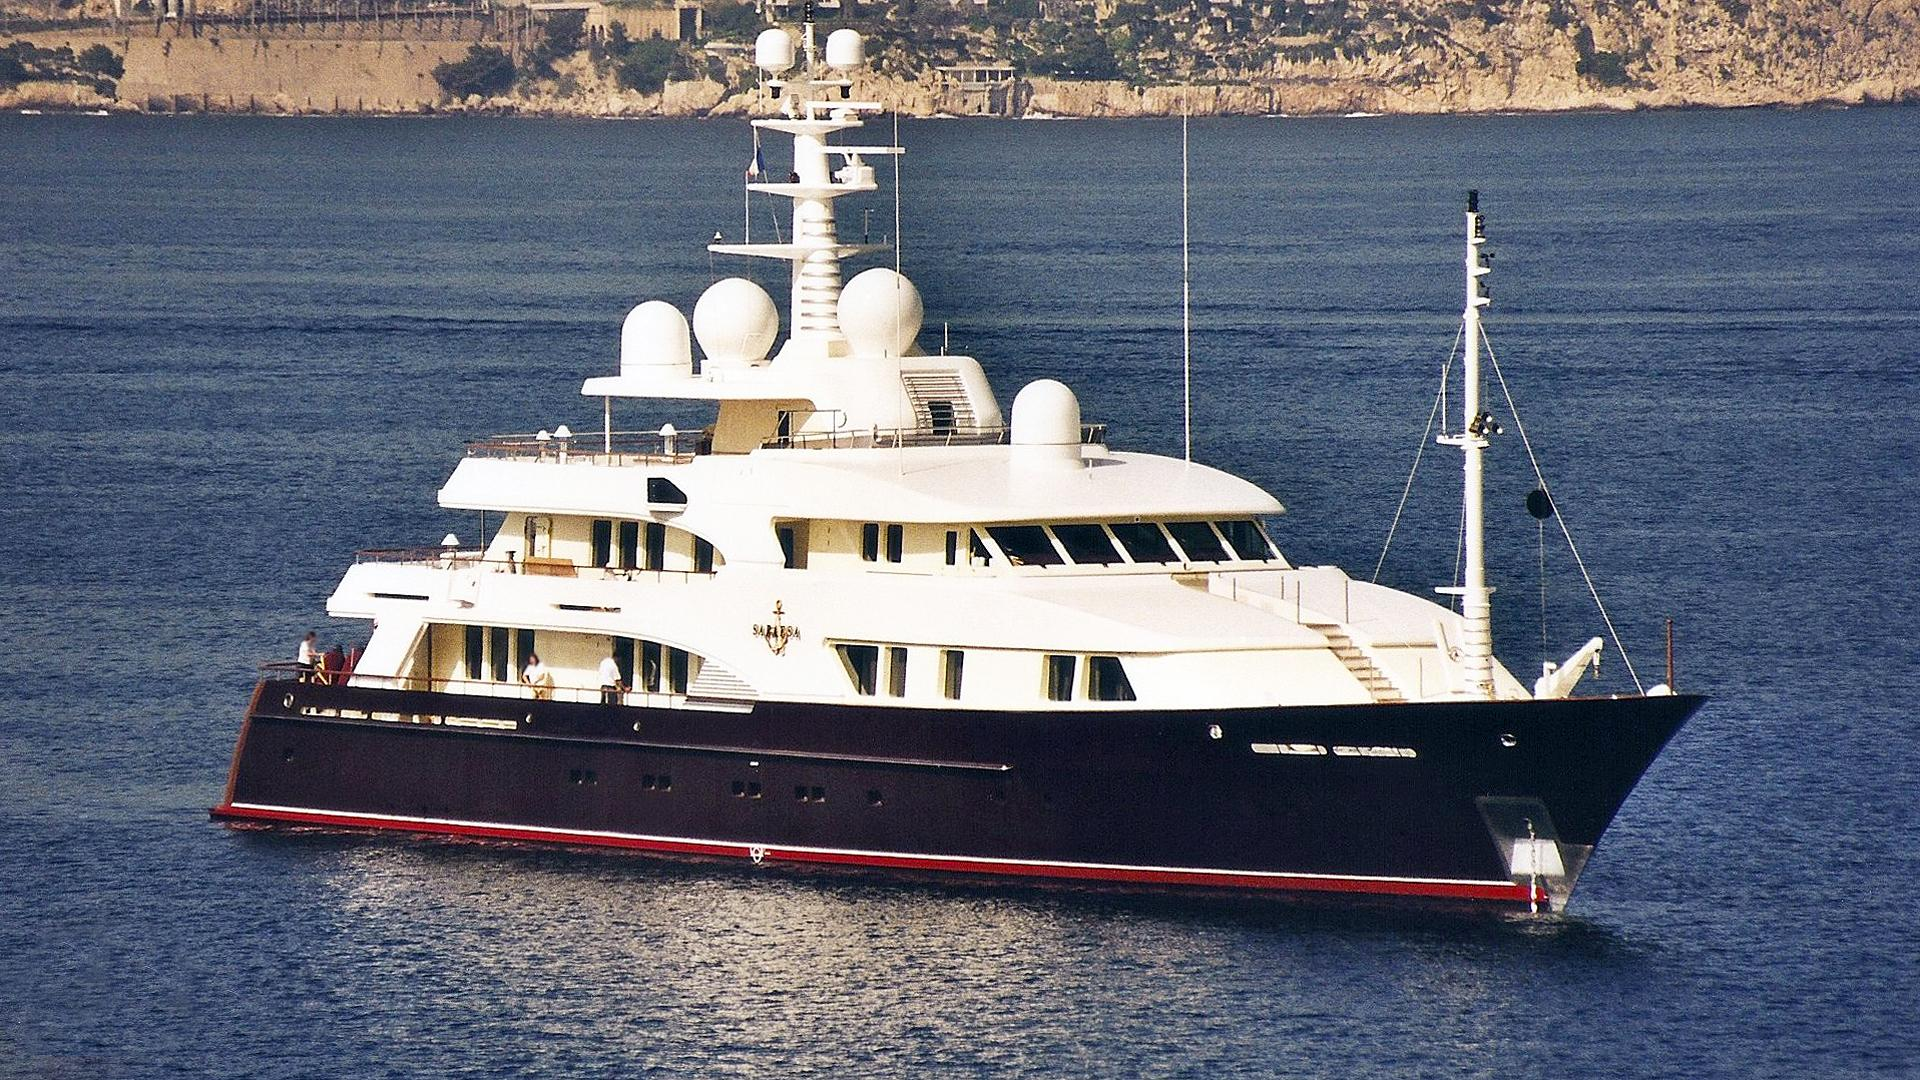 faribana-v-motor-yacht-amels-1998-54m-before-refit